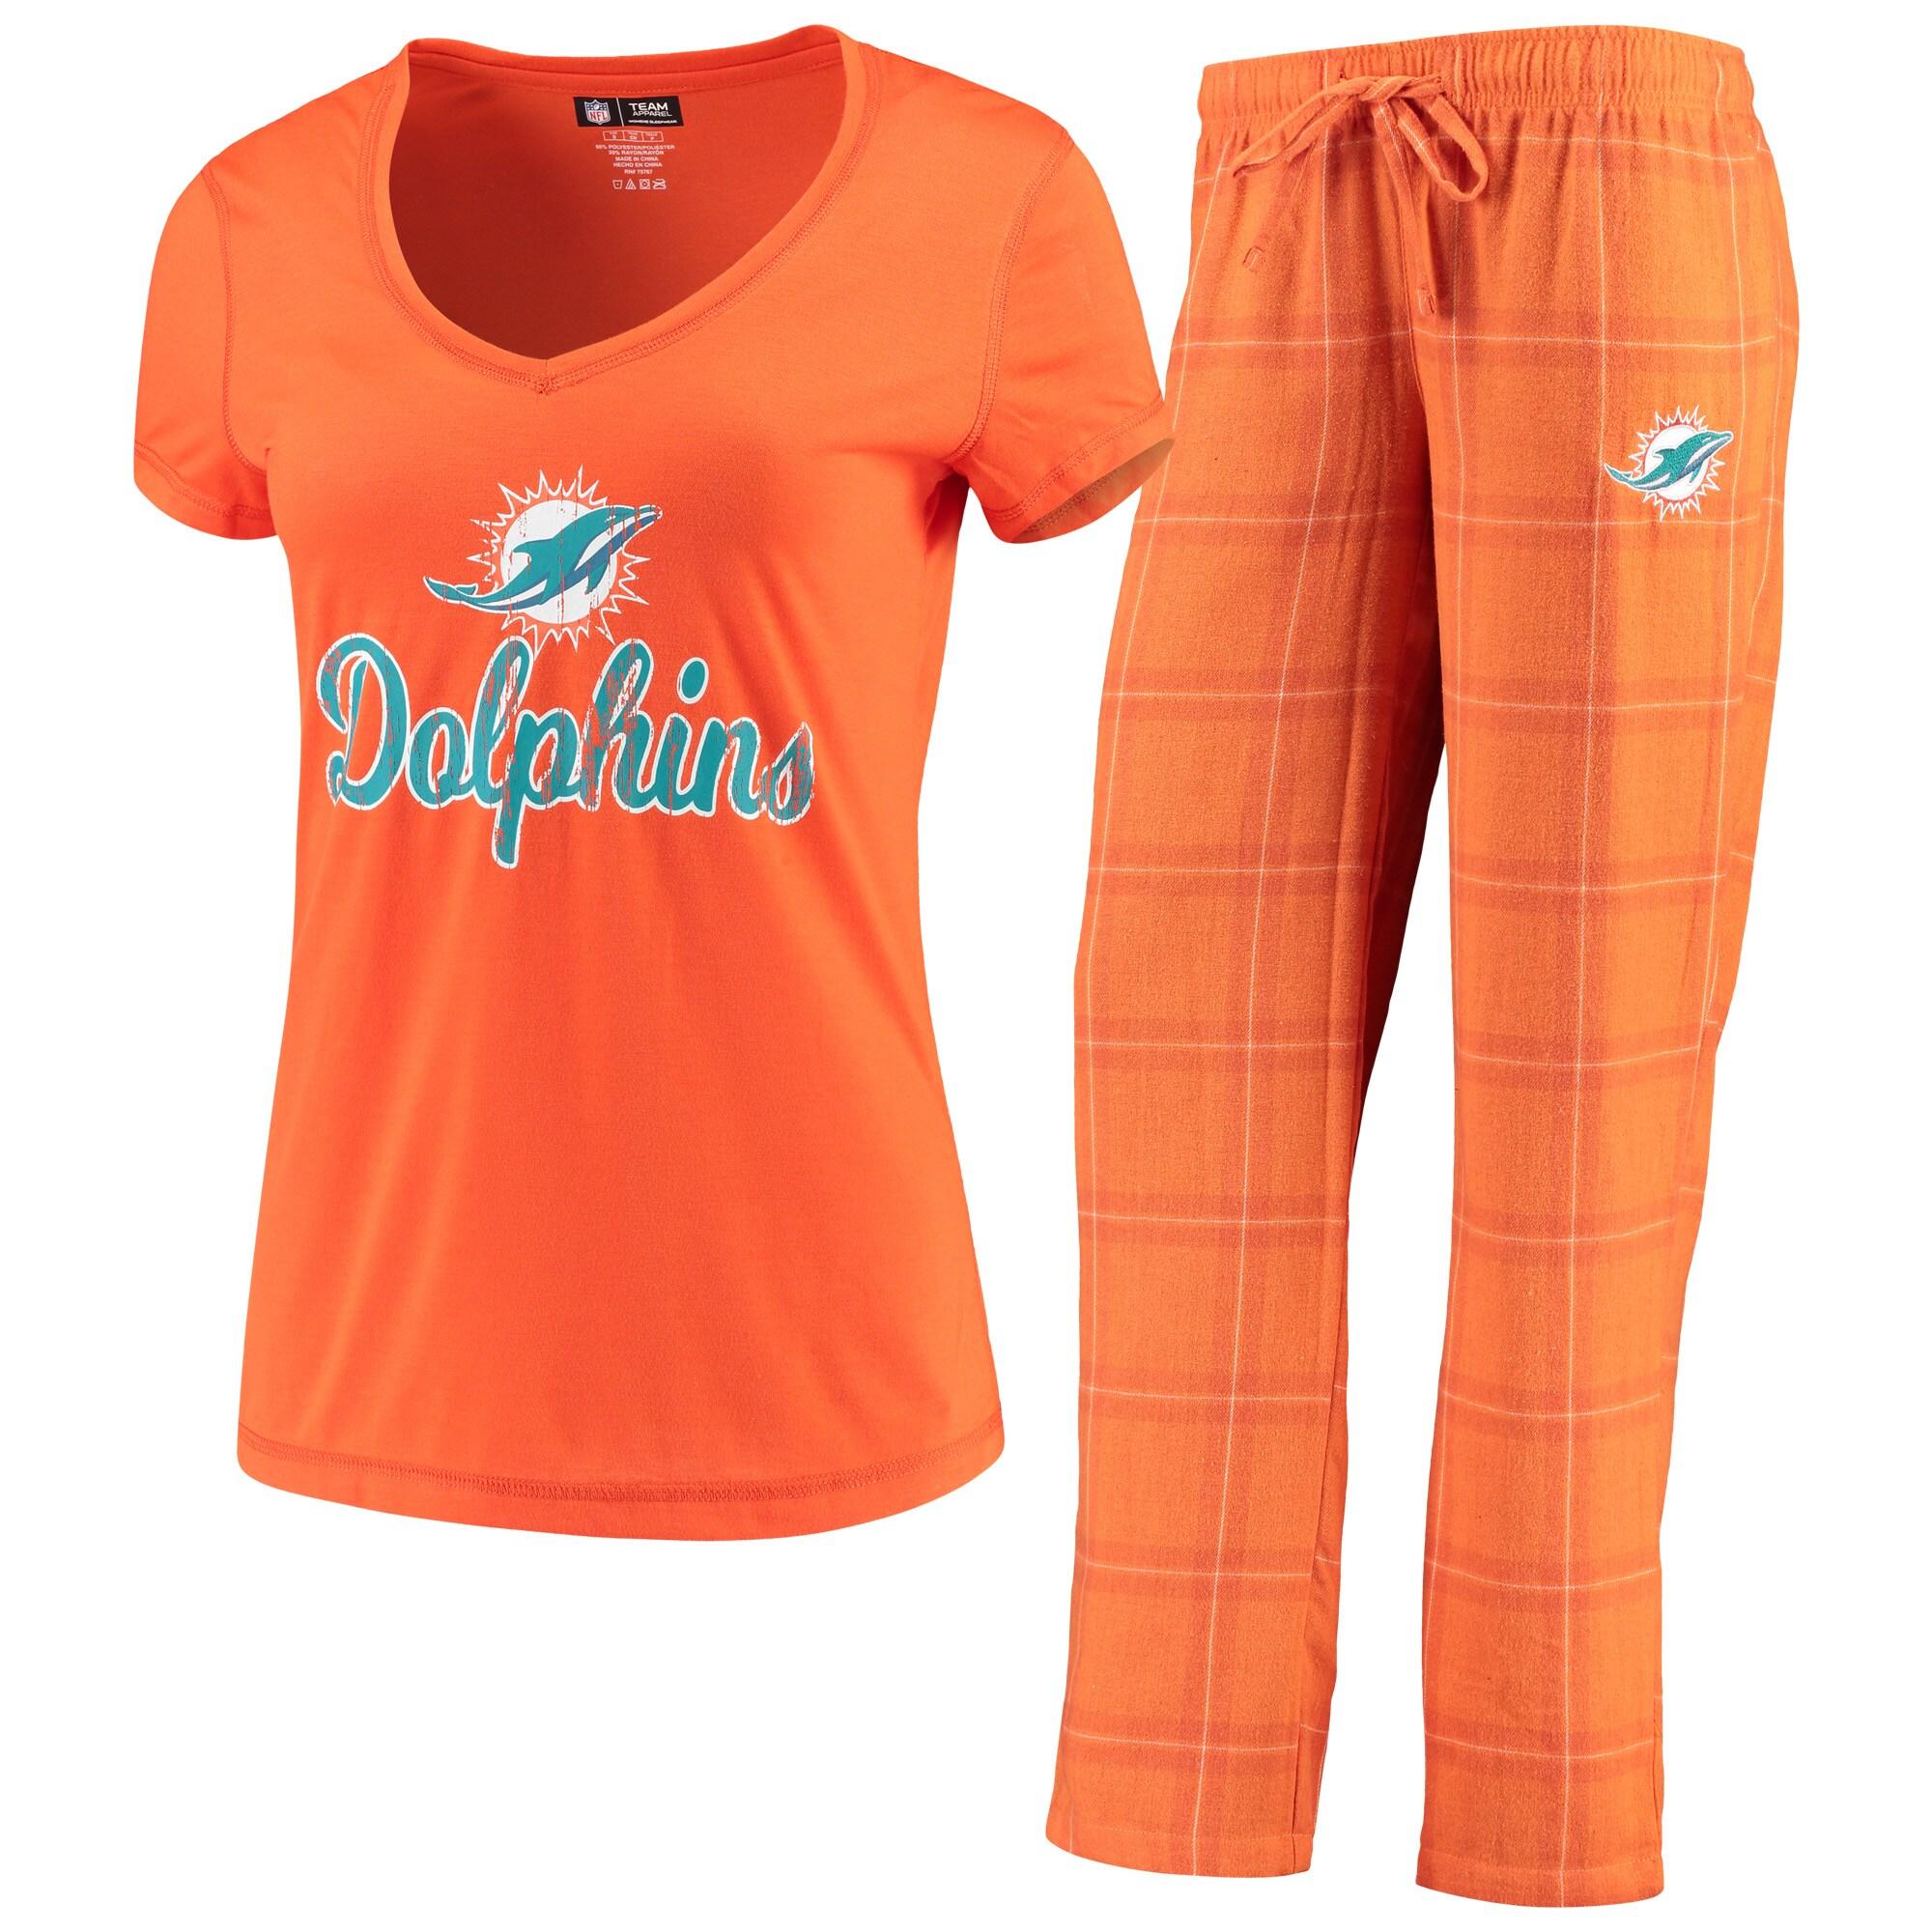 Miami Dolphins Concepts Sport Women's Troupe V-Neck T-Shirt & Pants Sleep Set - Orange/White